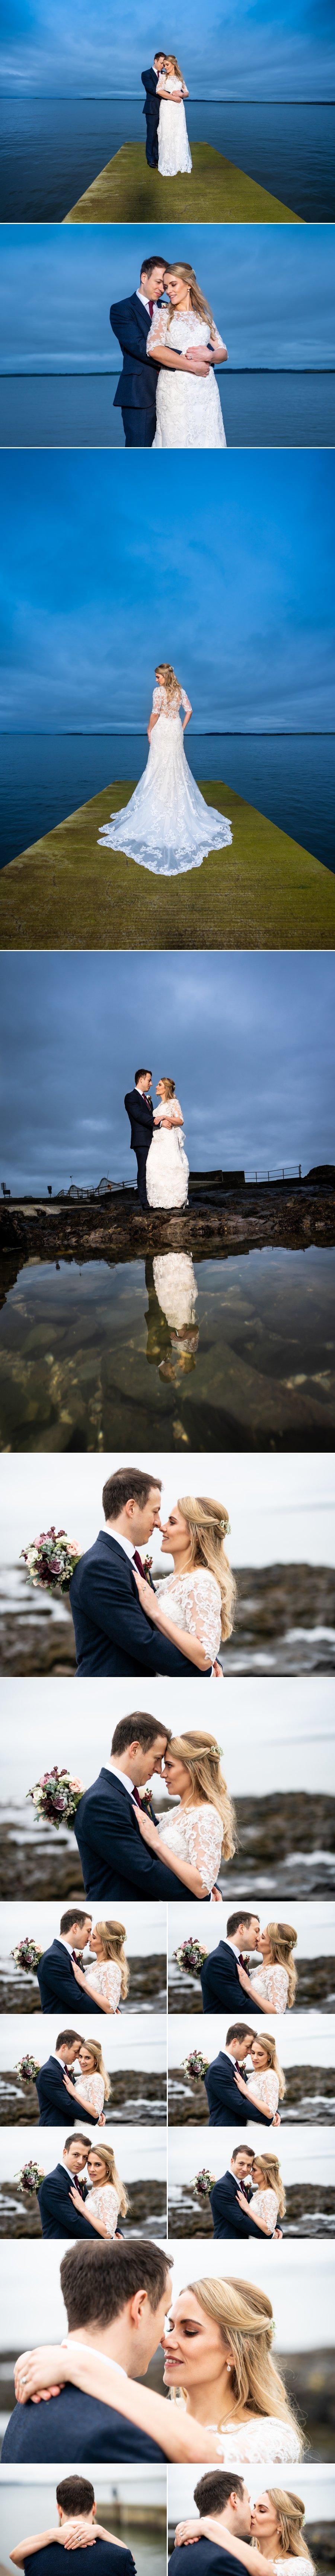 Markree Castle Sligo Wedding beautiful bride and groom photos